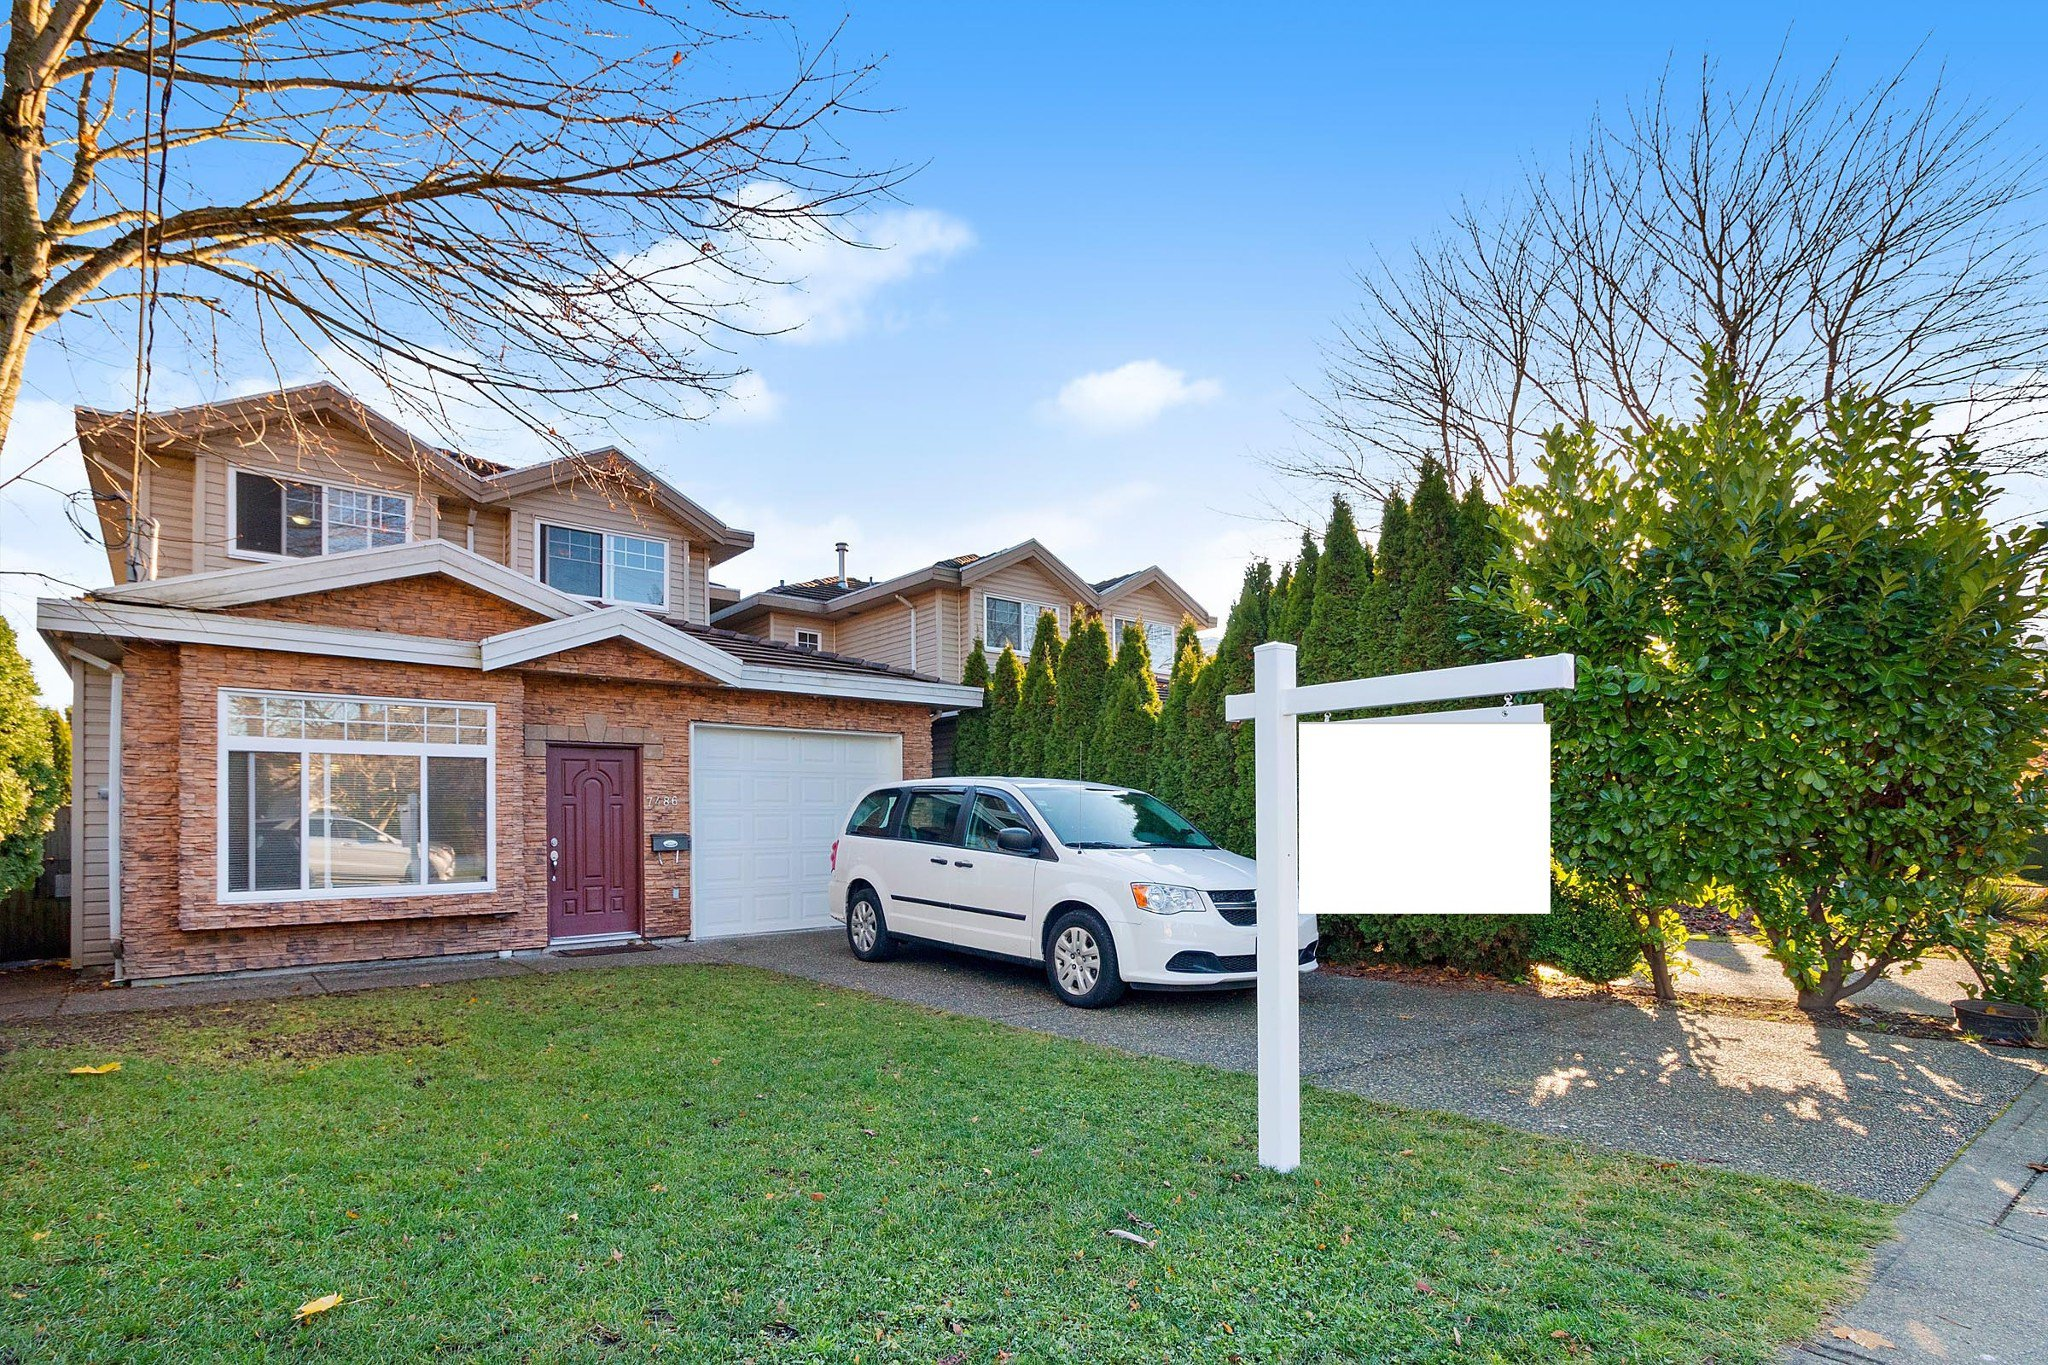 Main Photo: 7486 ELWELL Street in Burnaby: Highgate 1/2 Duplex for sale (Burnaby South)  : MLS®# R2520924